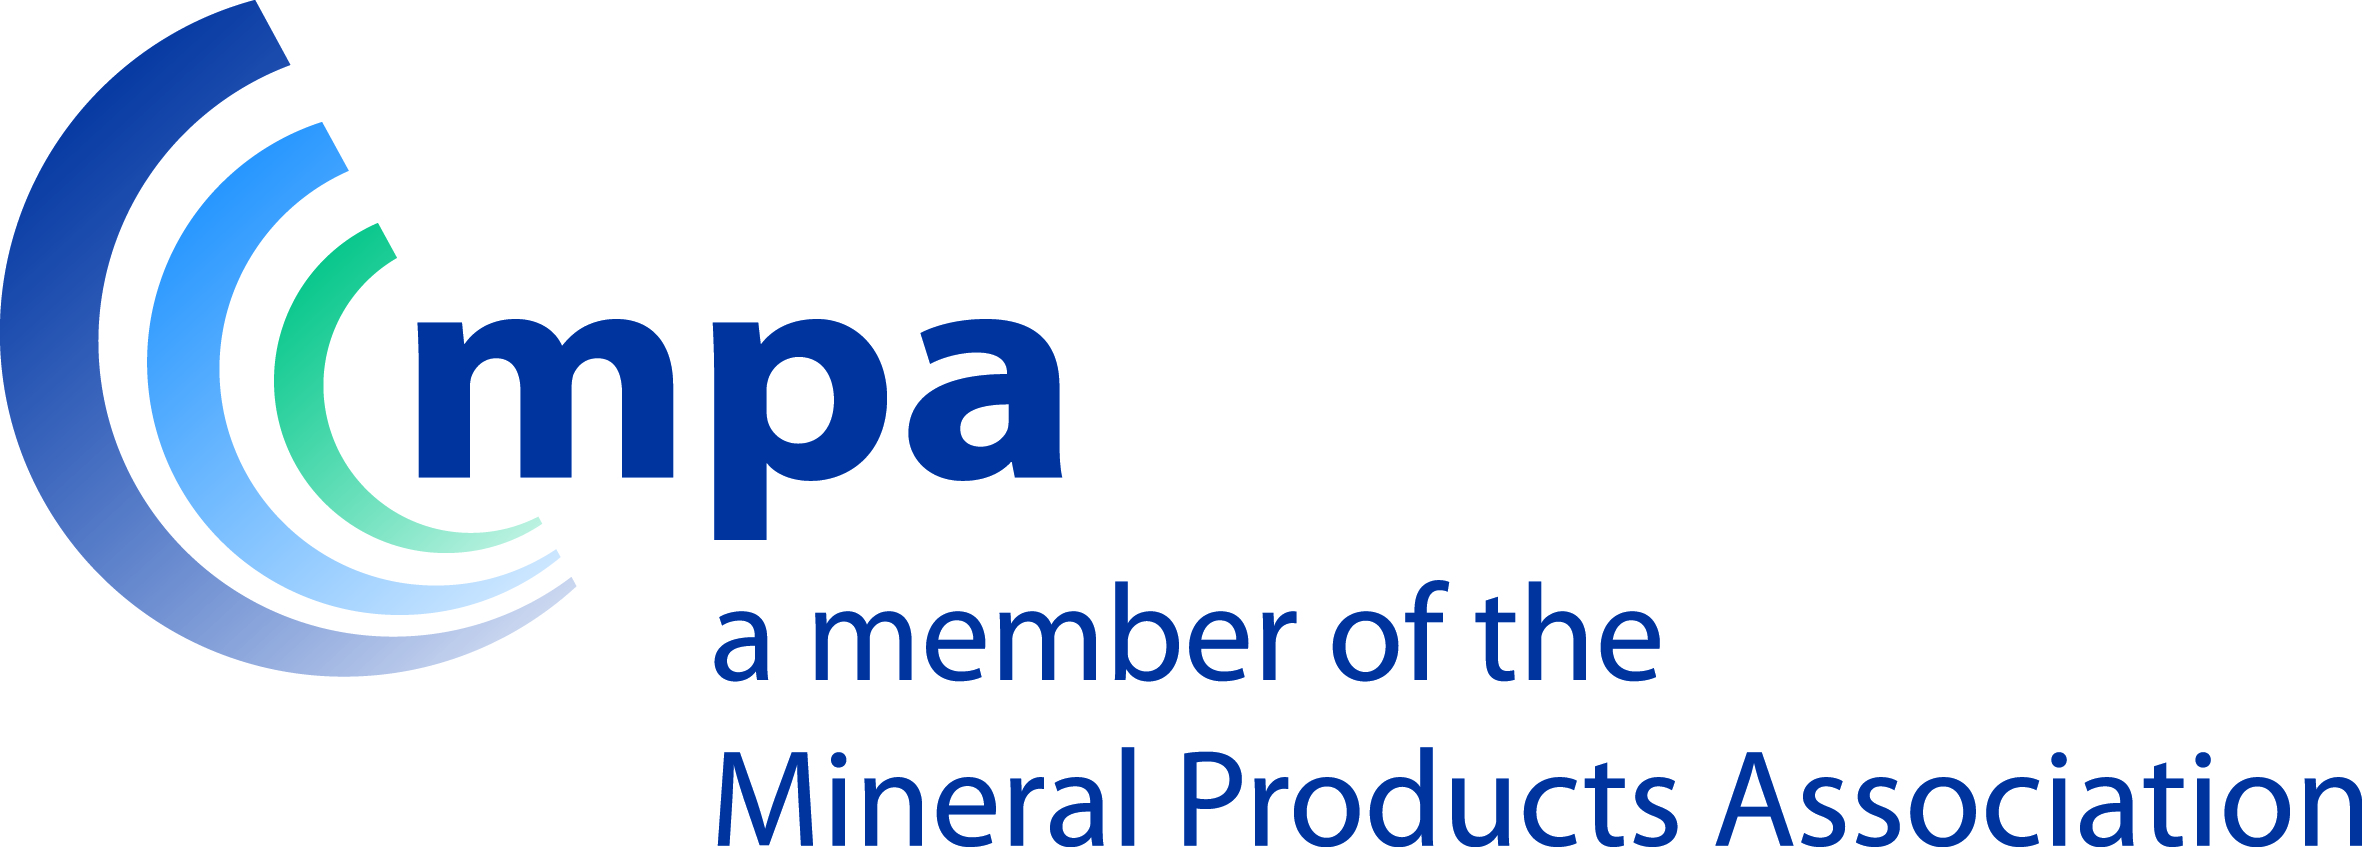 MPA Member logo